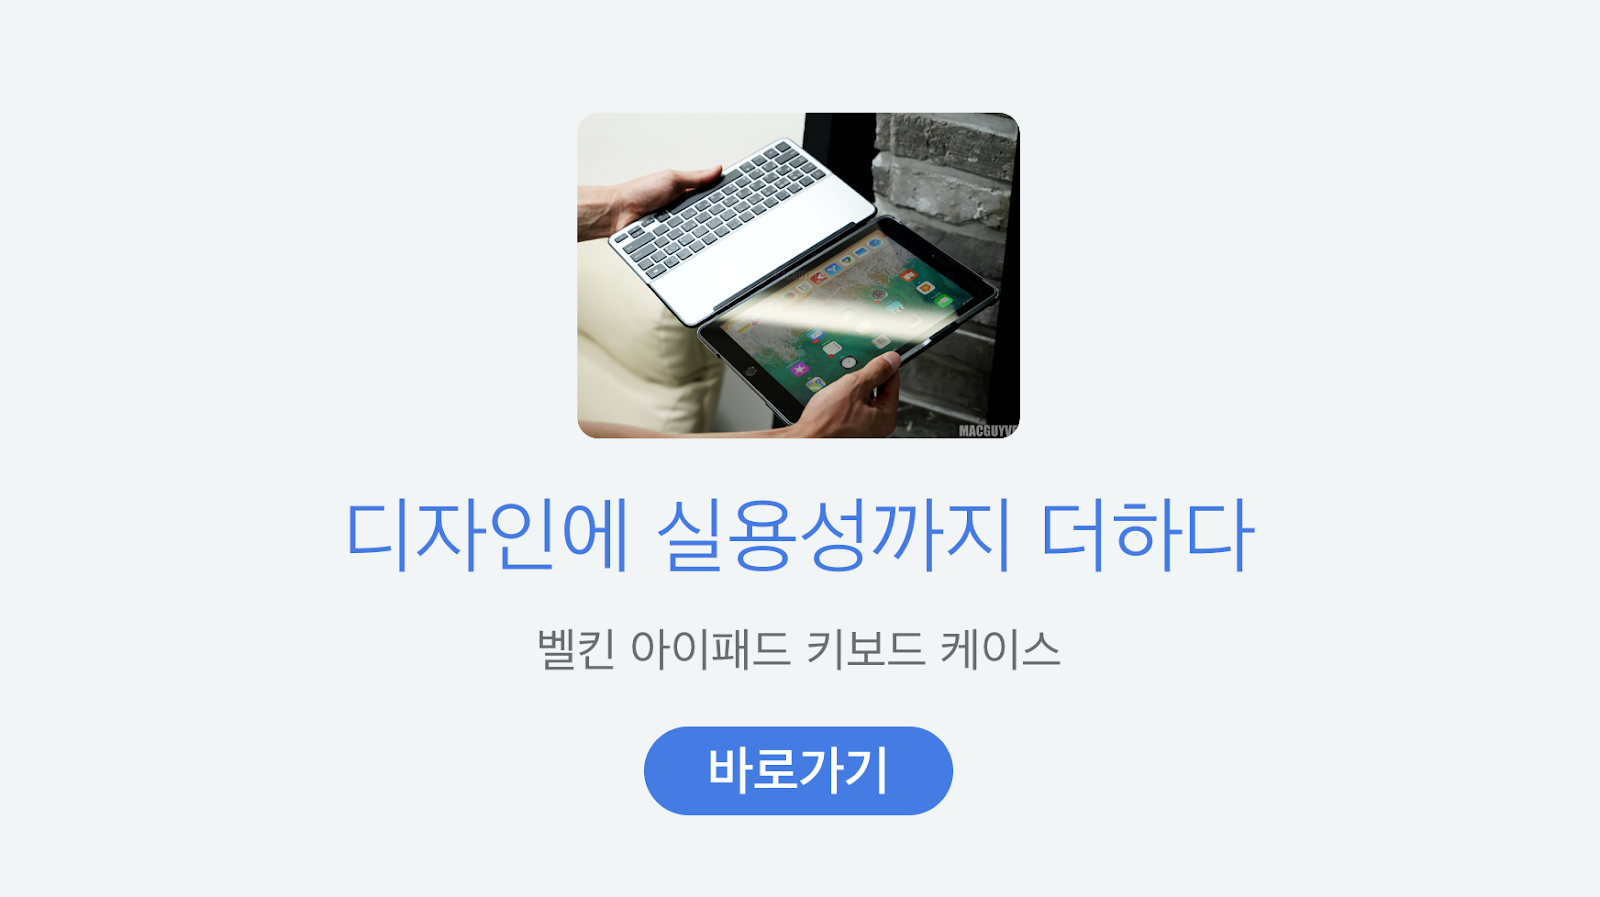 http://www.belkin.com/kr/search?text=qode